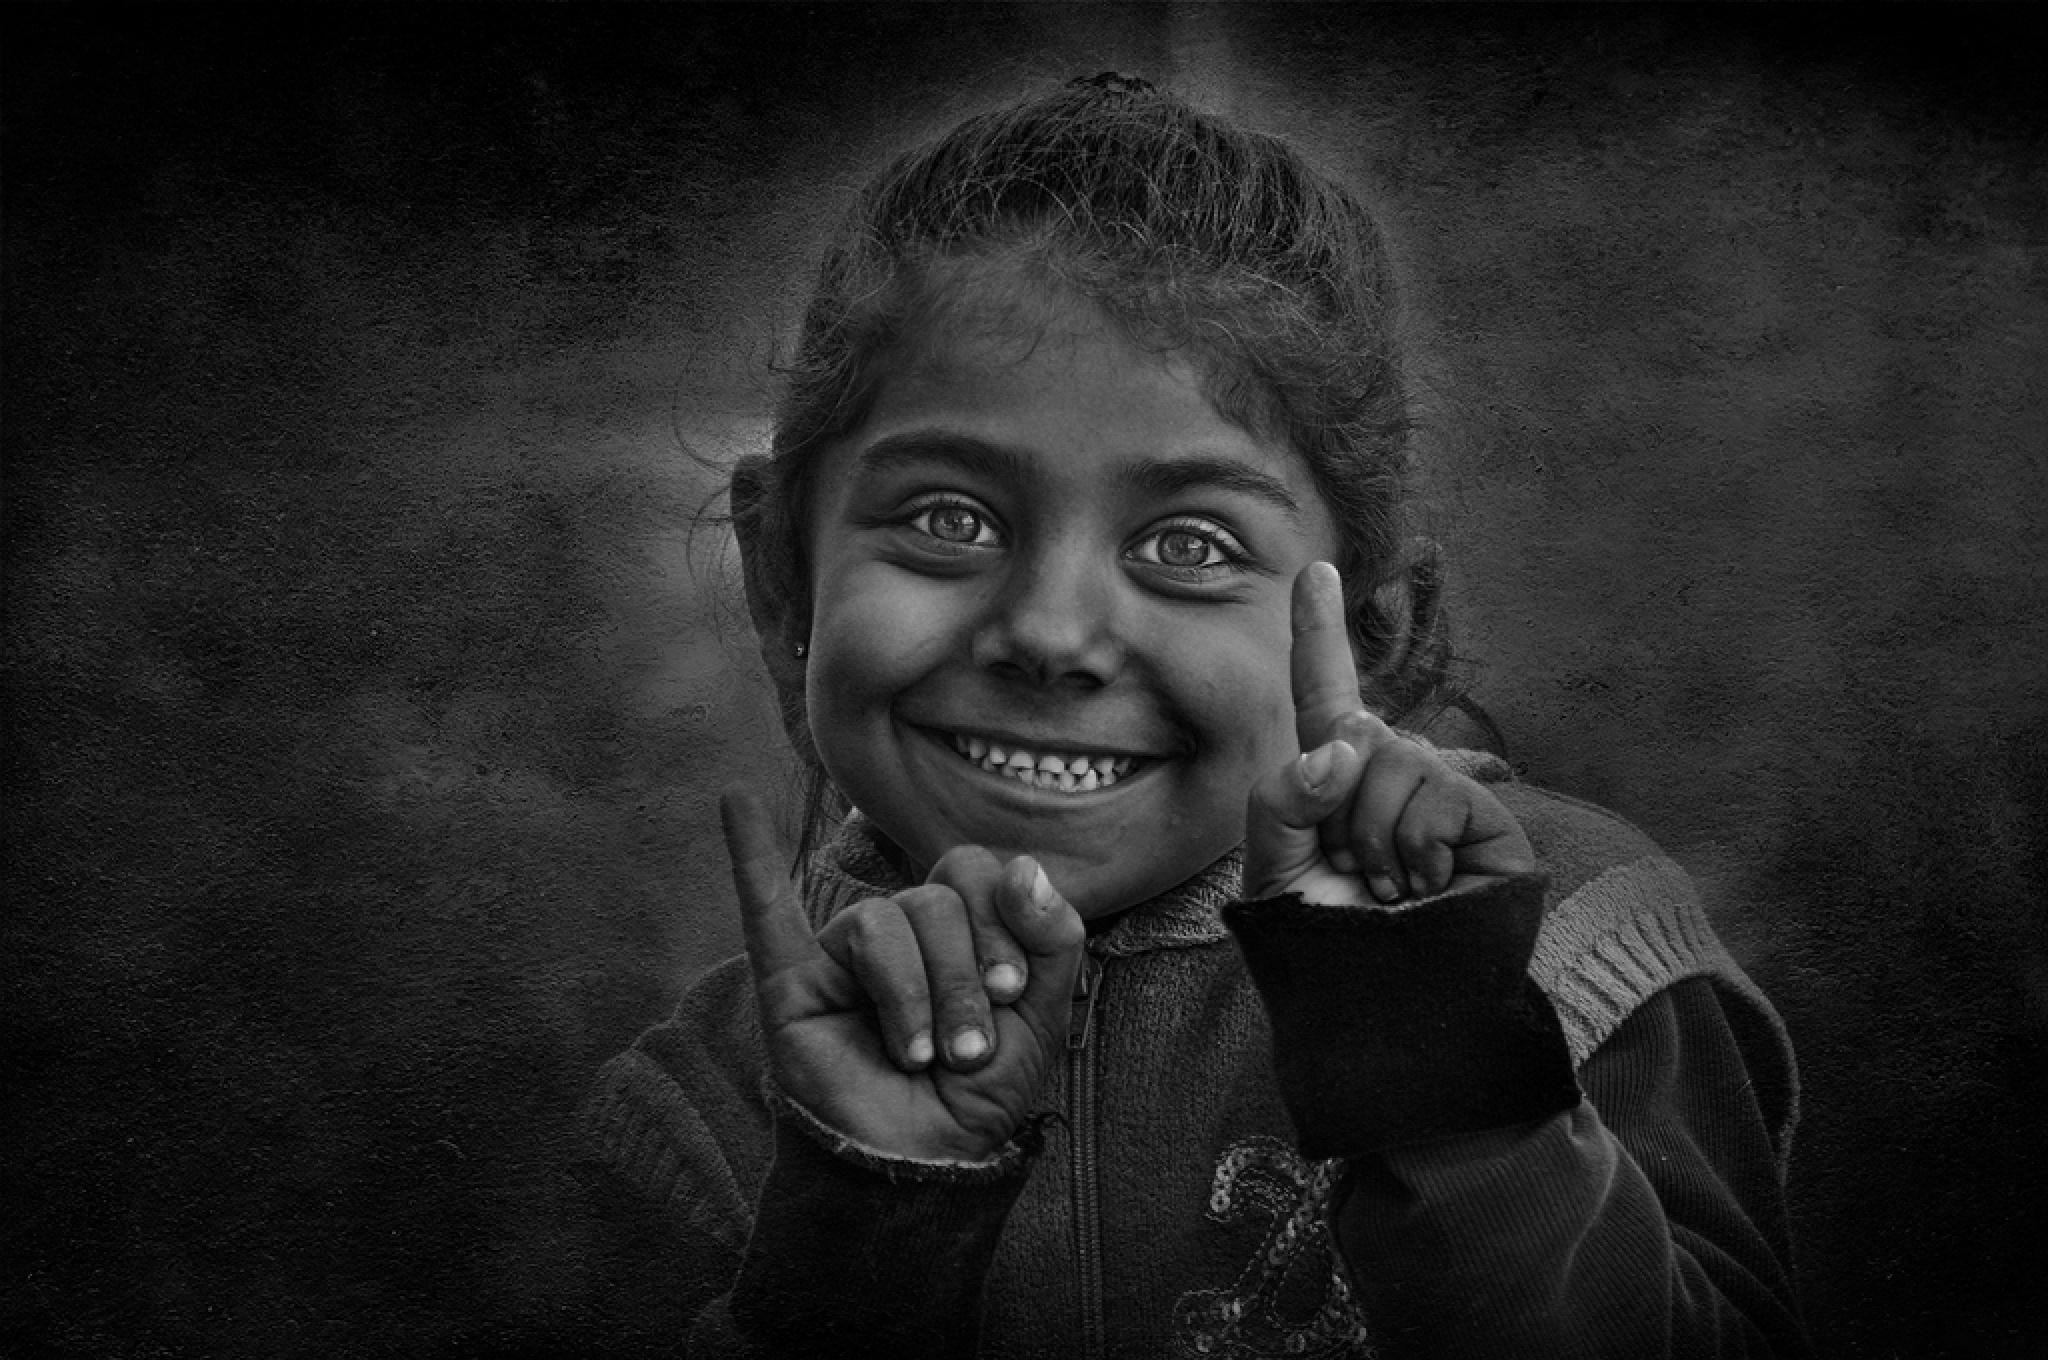 Untitled by AKadirAkar